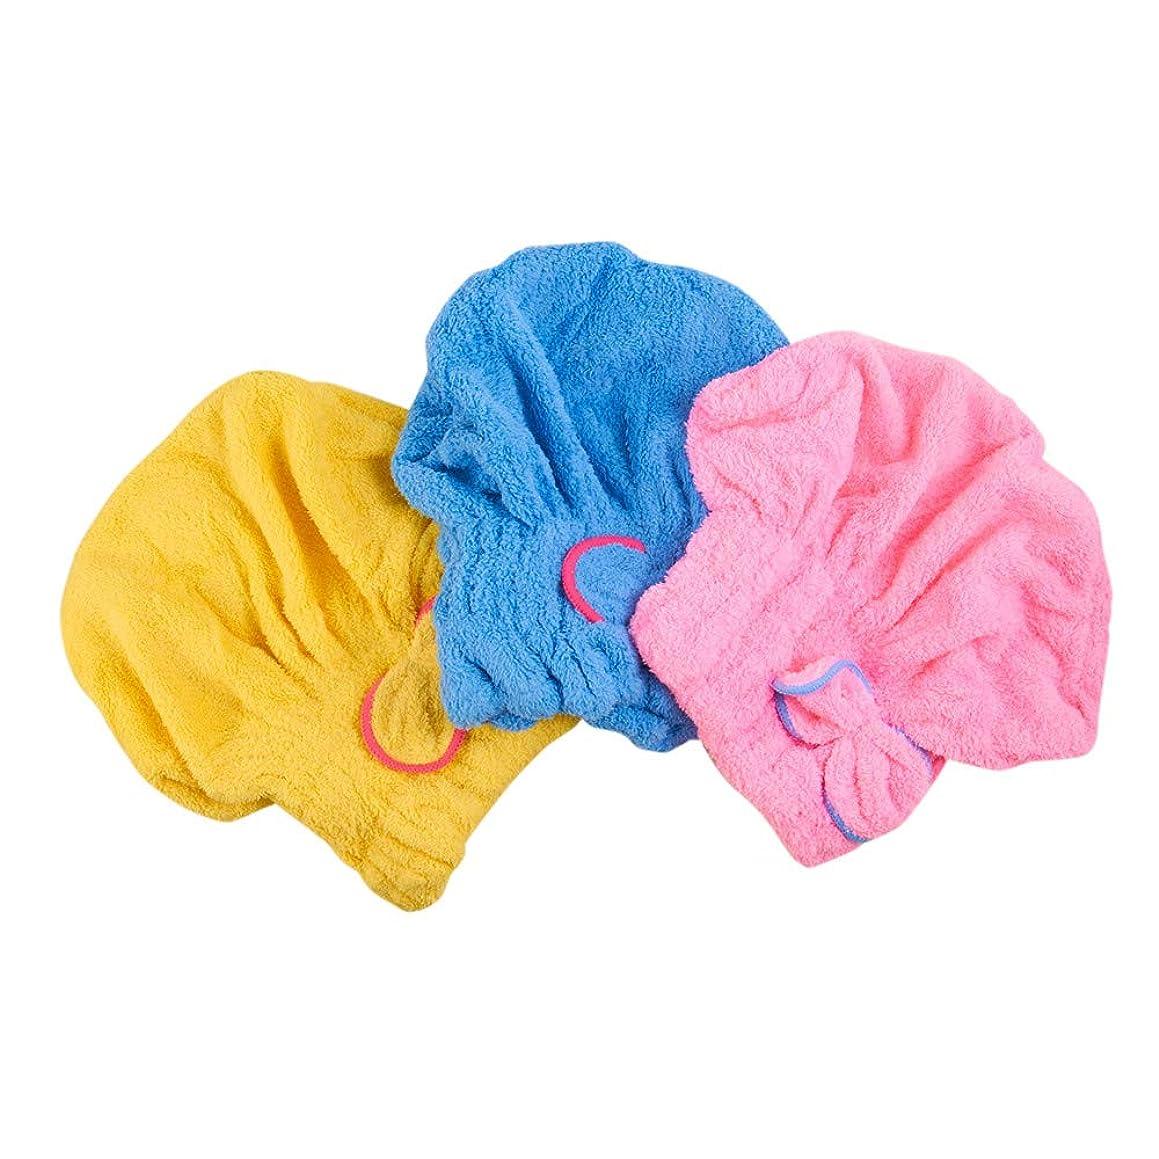 3 Pack Hair Drying Caps Towels, Ultra Absorbent Microfiber Drying Cap Bowknot Hair Towel Turban Hats Shower Tool